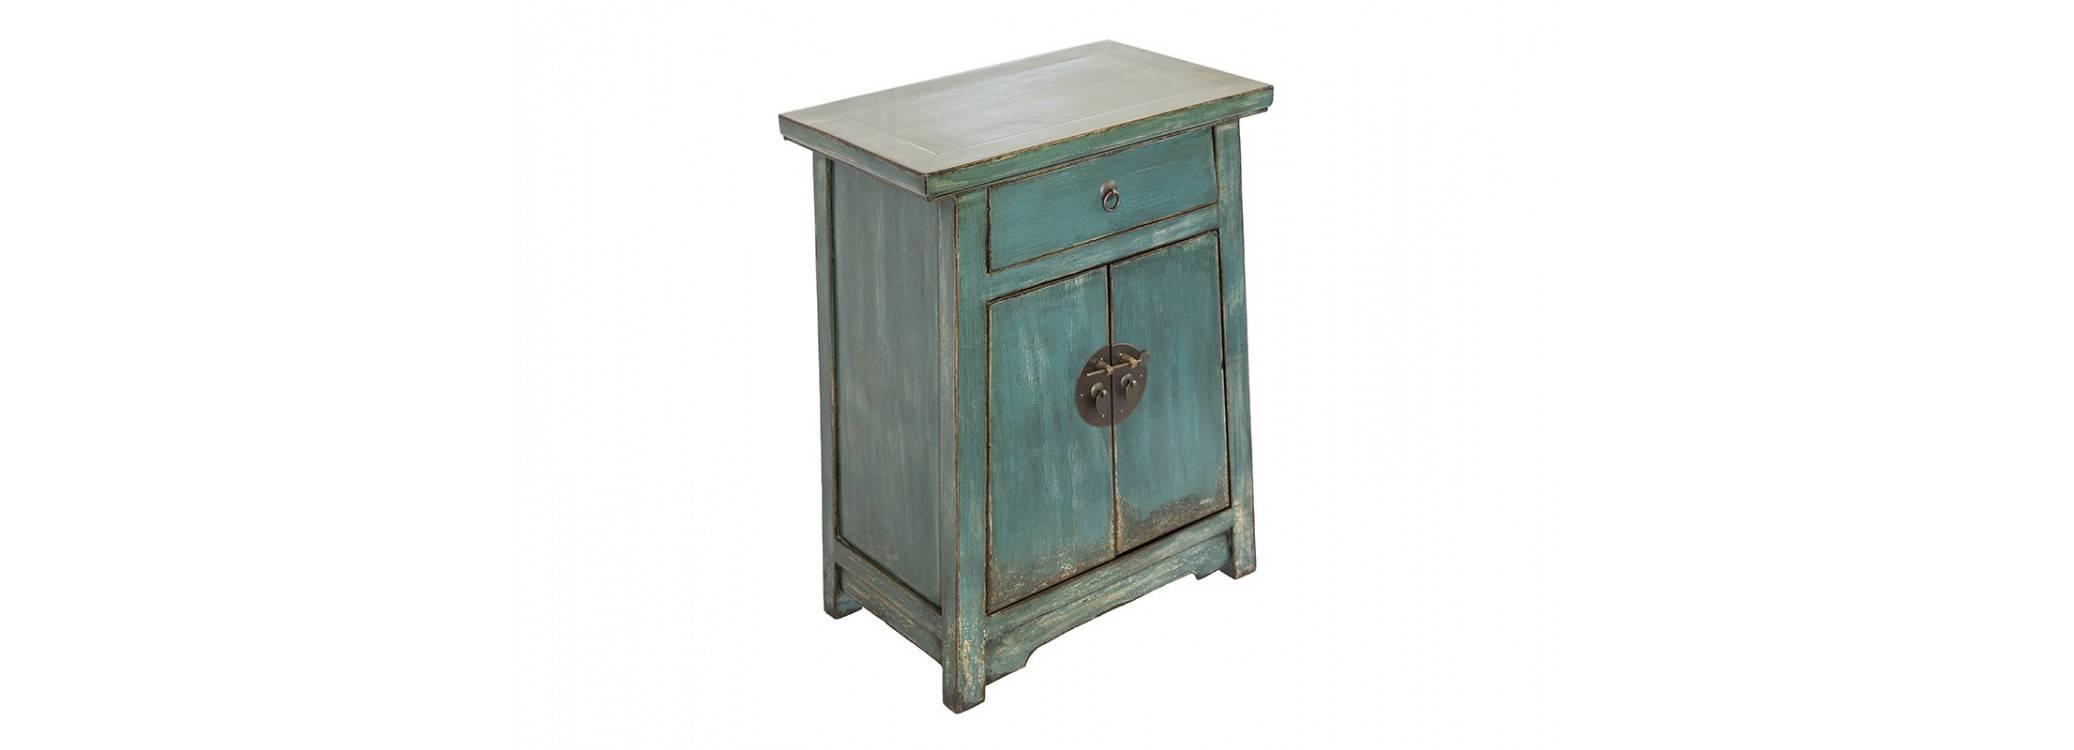 Meuble d'appoint Chinois - 2 portes 1 tiroir - Vert d'eau